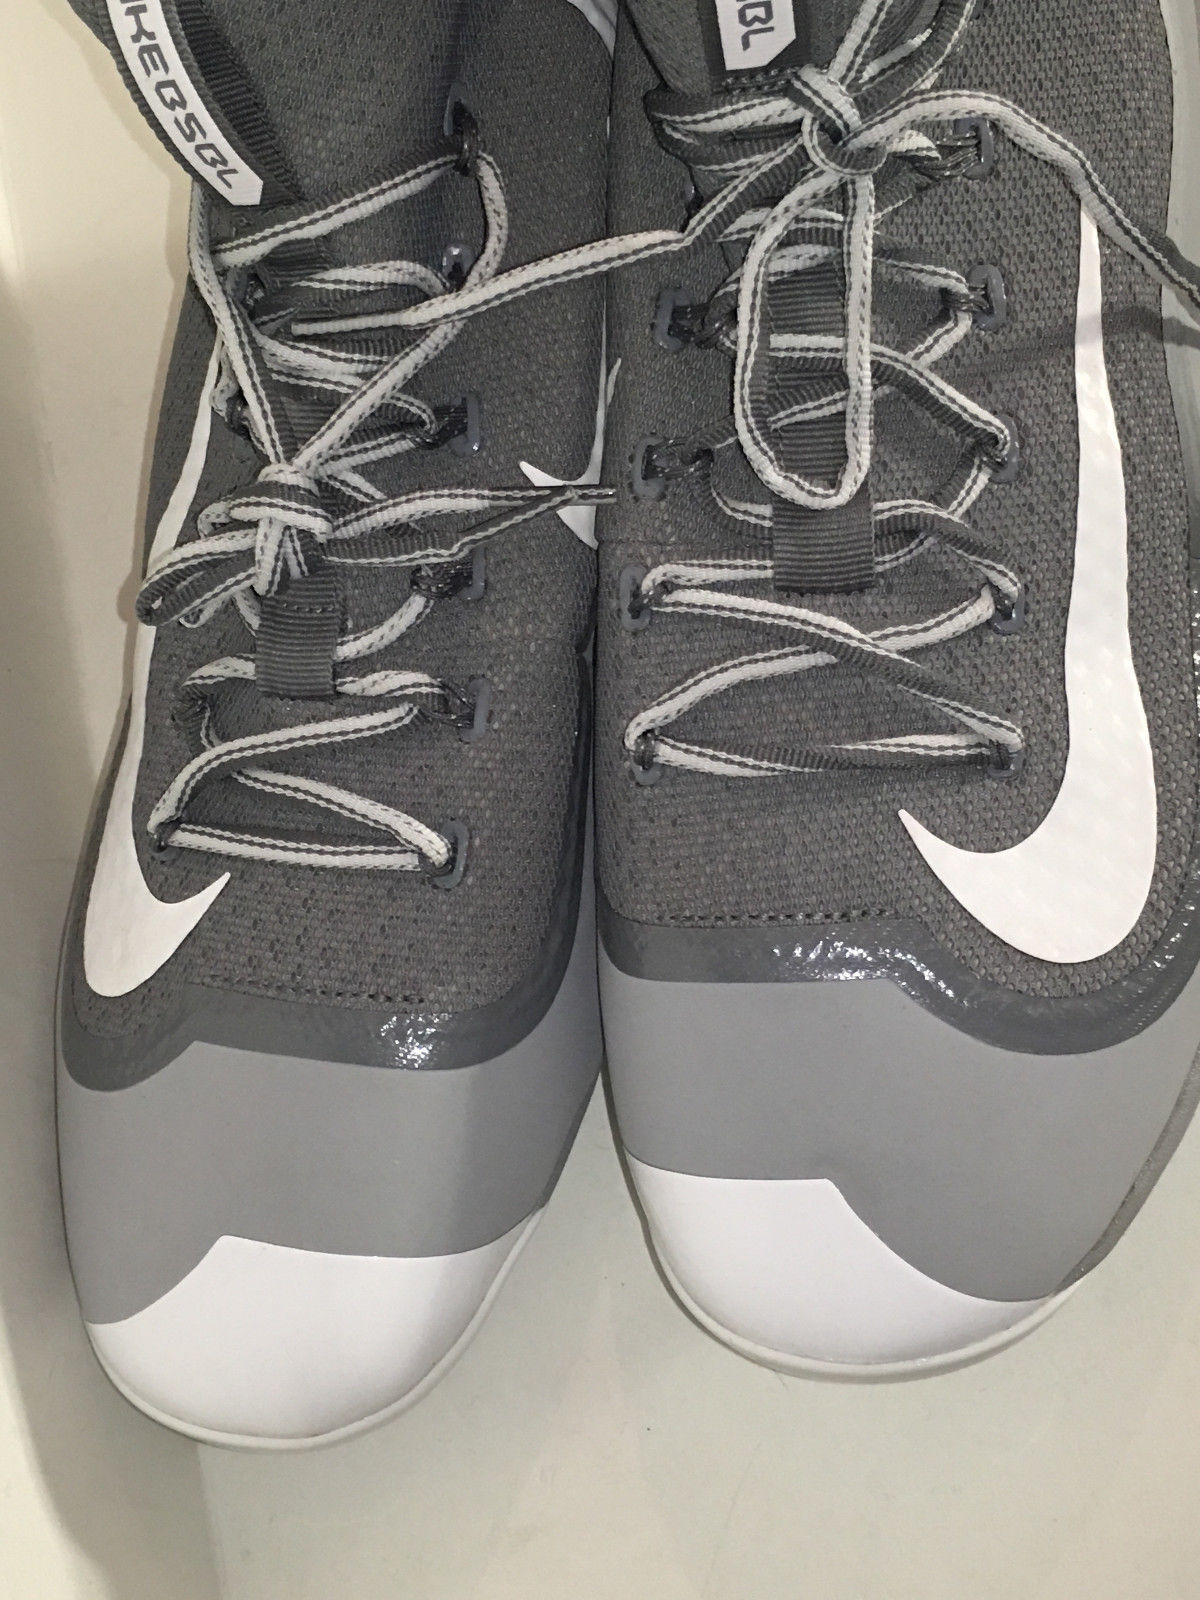 the best attitude f31c8 37bb0 ... Nike 749359-011 Air Huarache 2K Filth Elite Mid Baseball Cleats Grey  size 14 ...